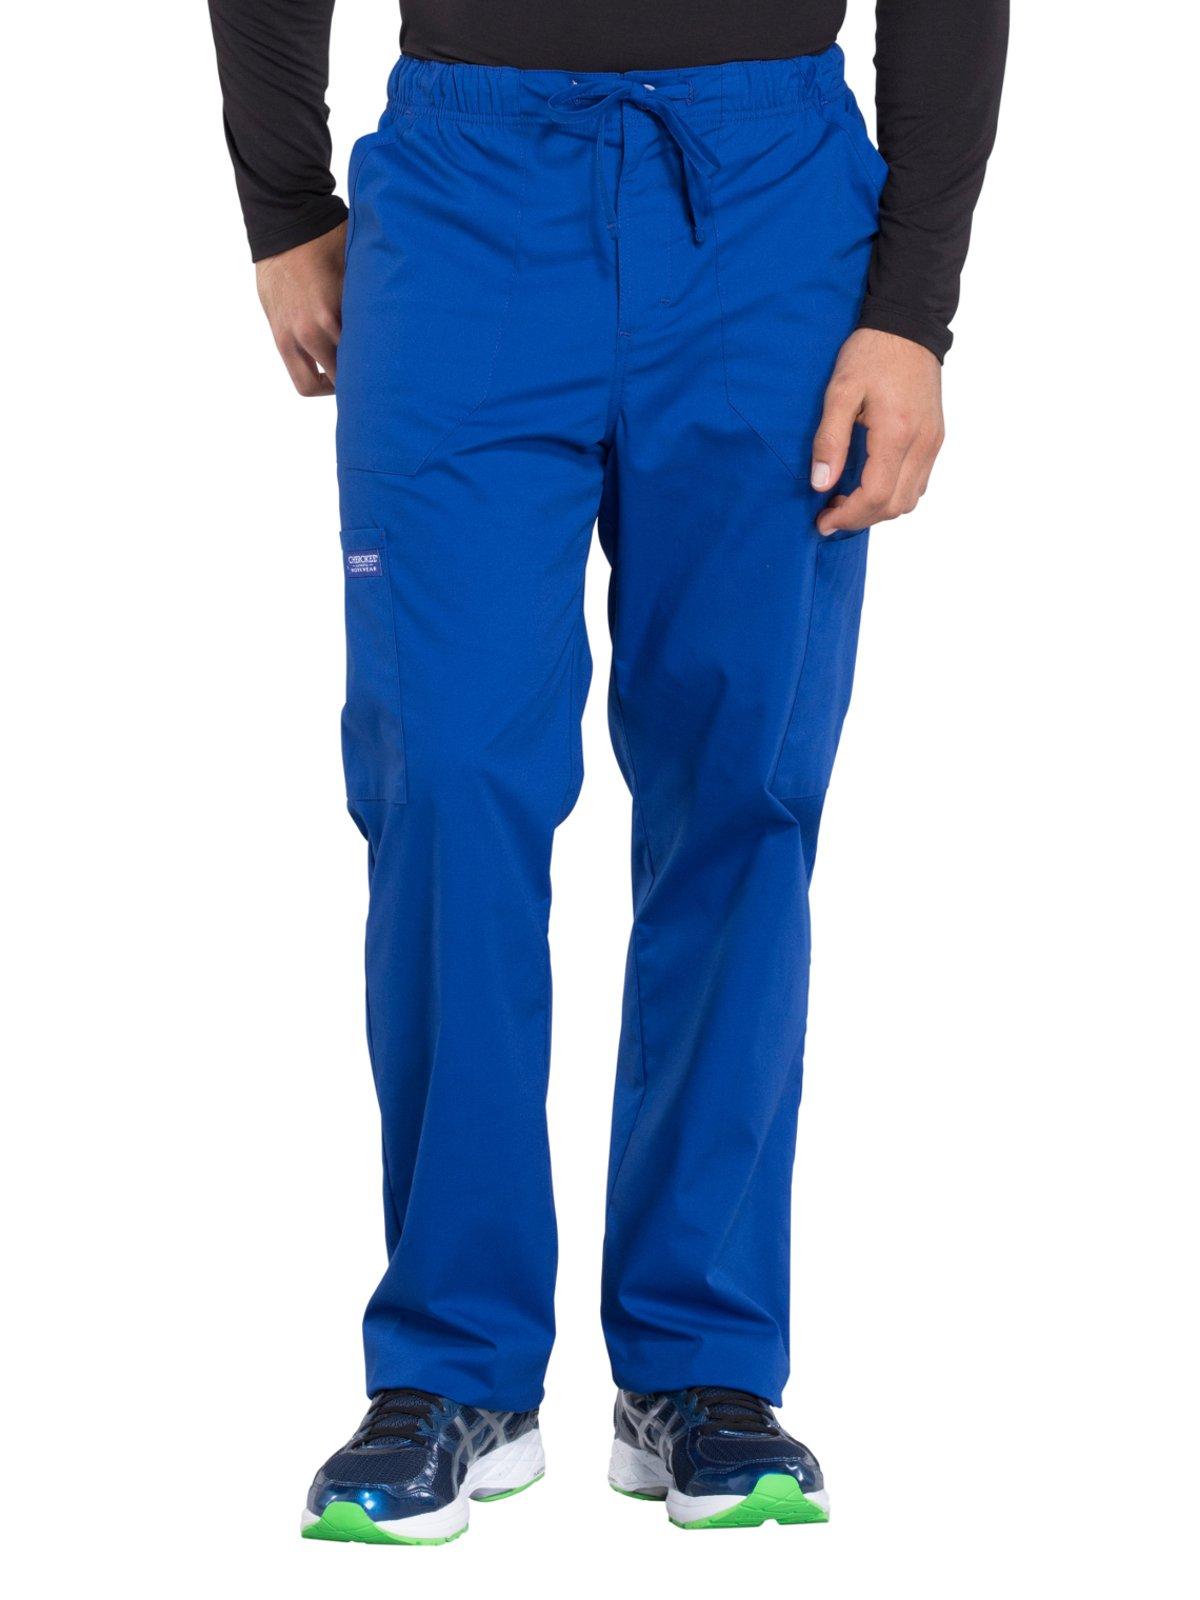 Cherokee Professionals Workwear Men's Tapered Leg Zip Fly Drawstring Scrub Pant Small Tall Galaxy Blue